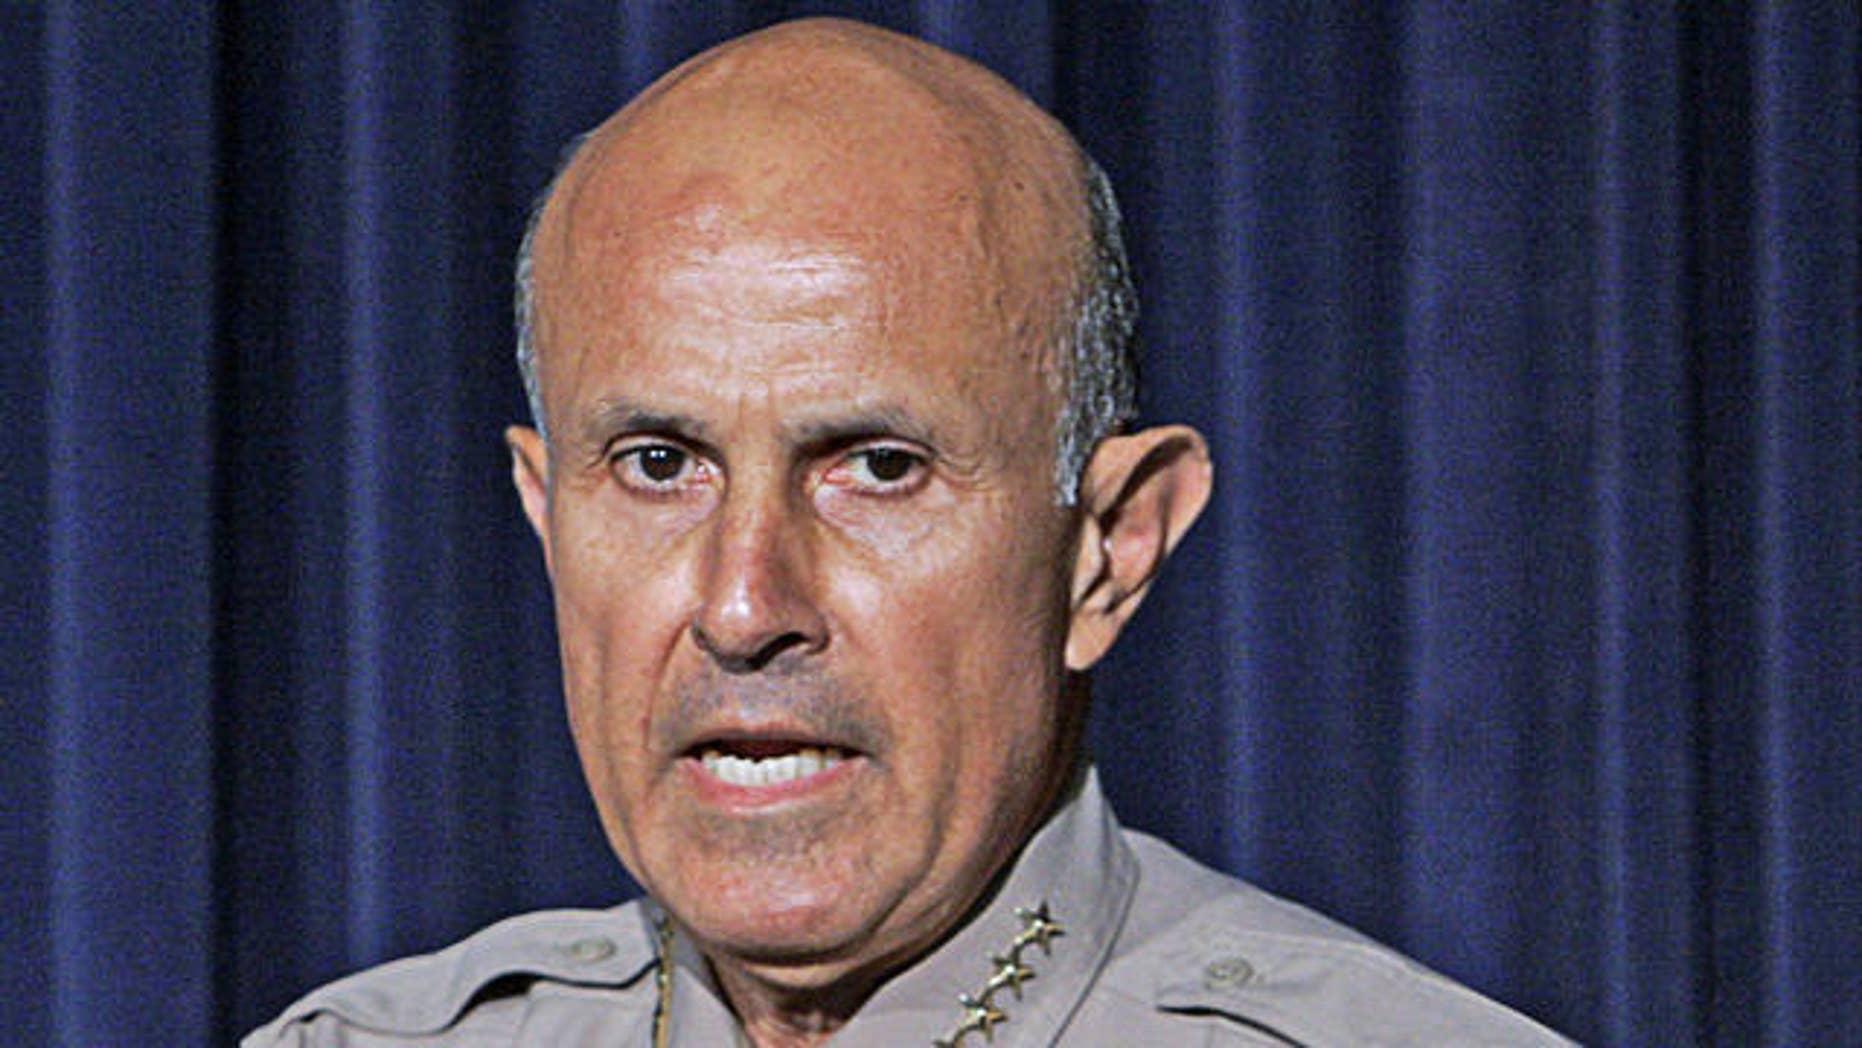 Los Angeles County Sheriff Lee Baca.